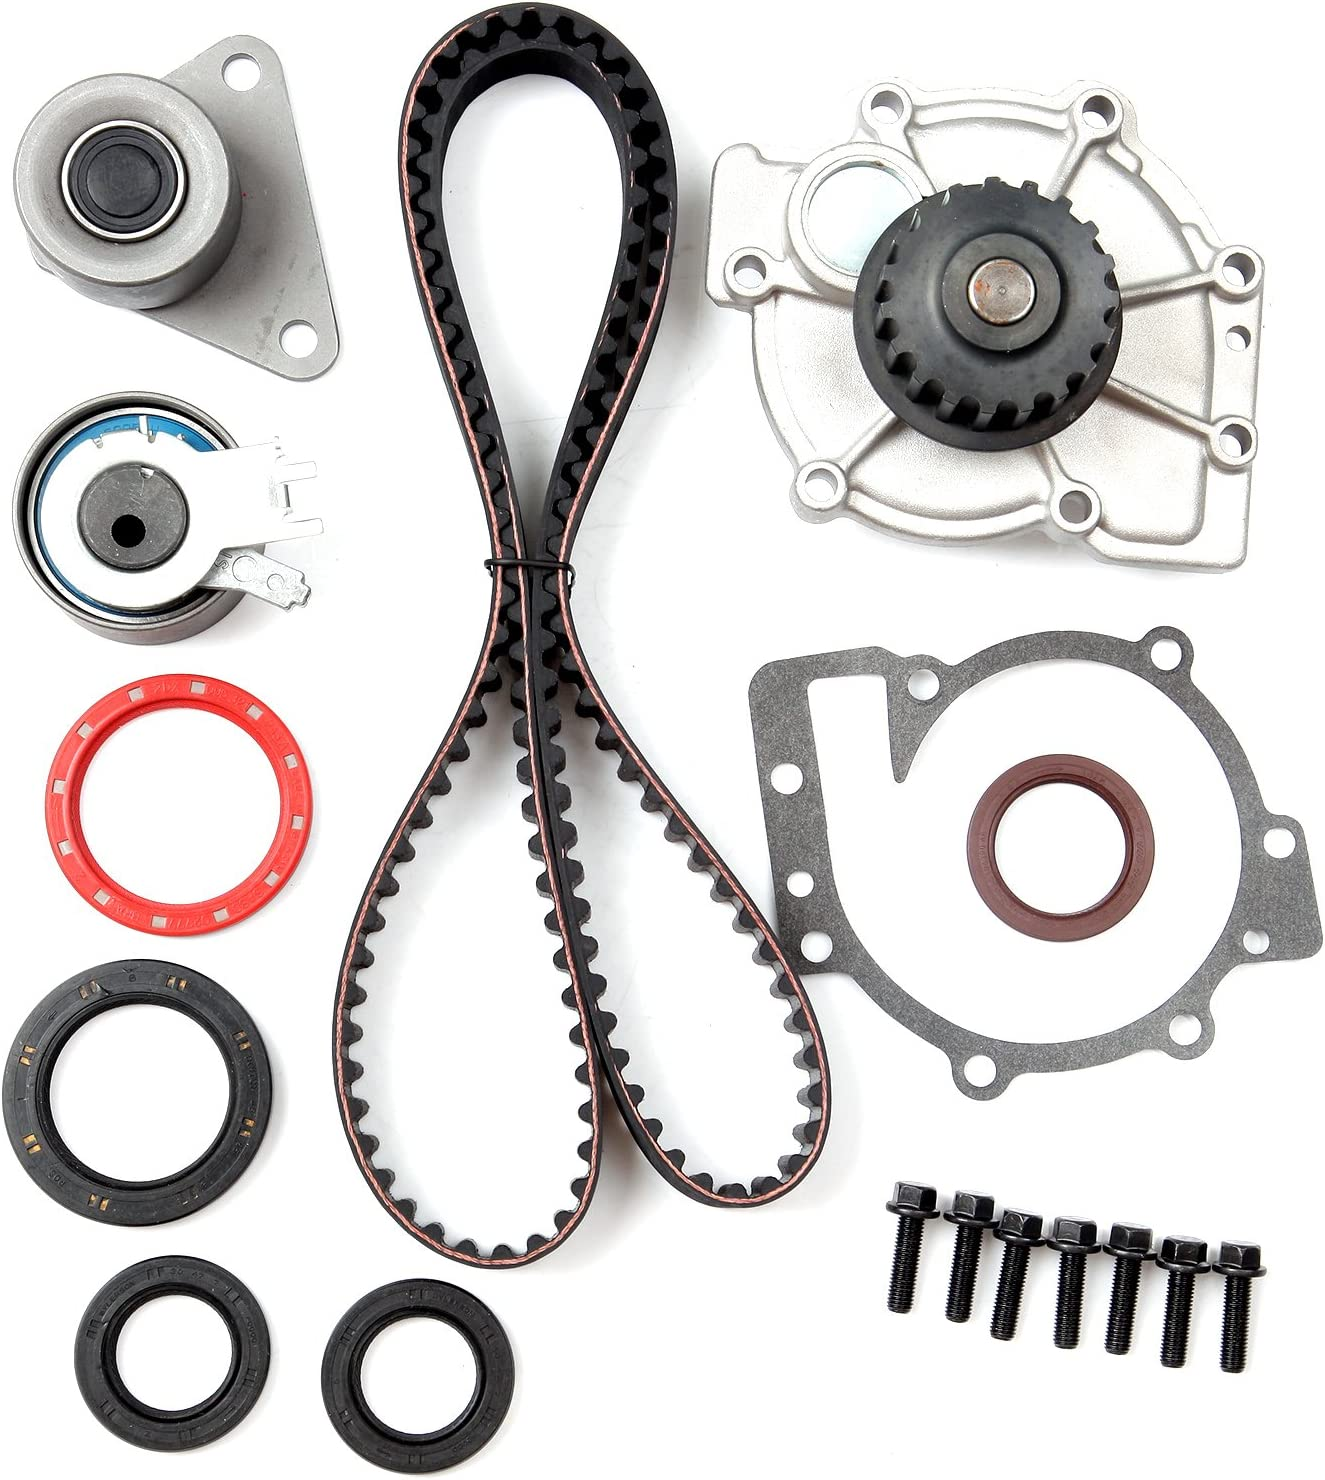 ANPART Timing Belt Kit Fit For 2000-2004 Volvo V40 1998-2007 2009-2010 Volvo V70 2003-2007 2009-2010 Volvo XC70 2005-2006 Volvo XC90 Timing Belt Water Pump Tensioner Gasket Set